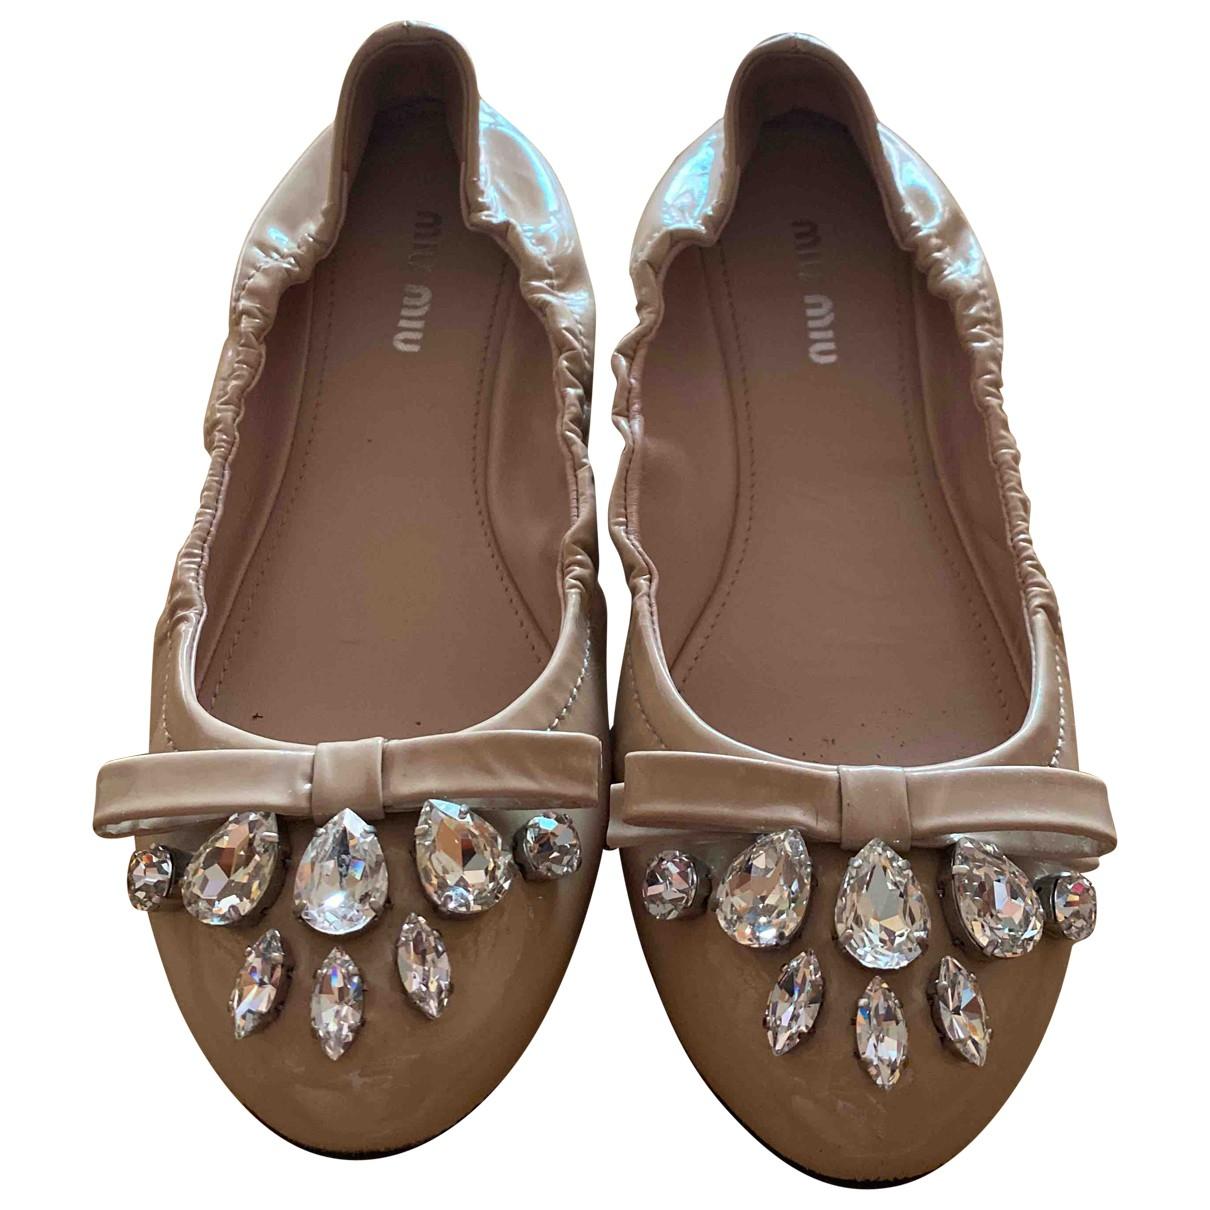 Miu Miu \N Pink Patent leather Ballet flats for Women 36.5 EU